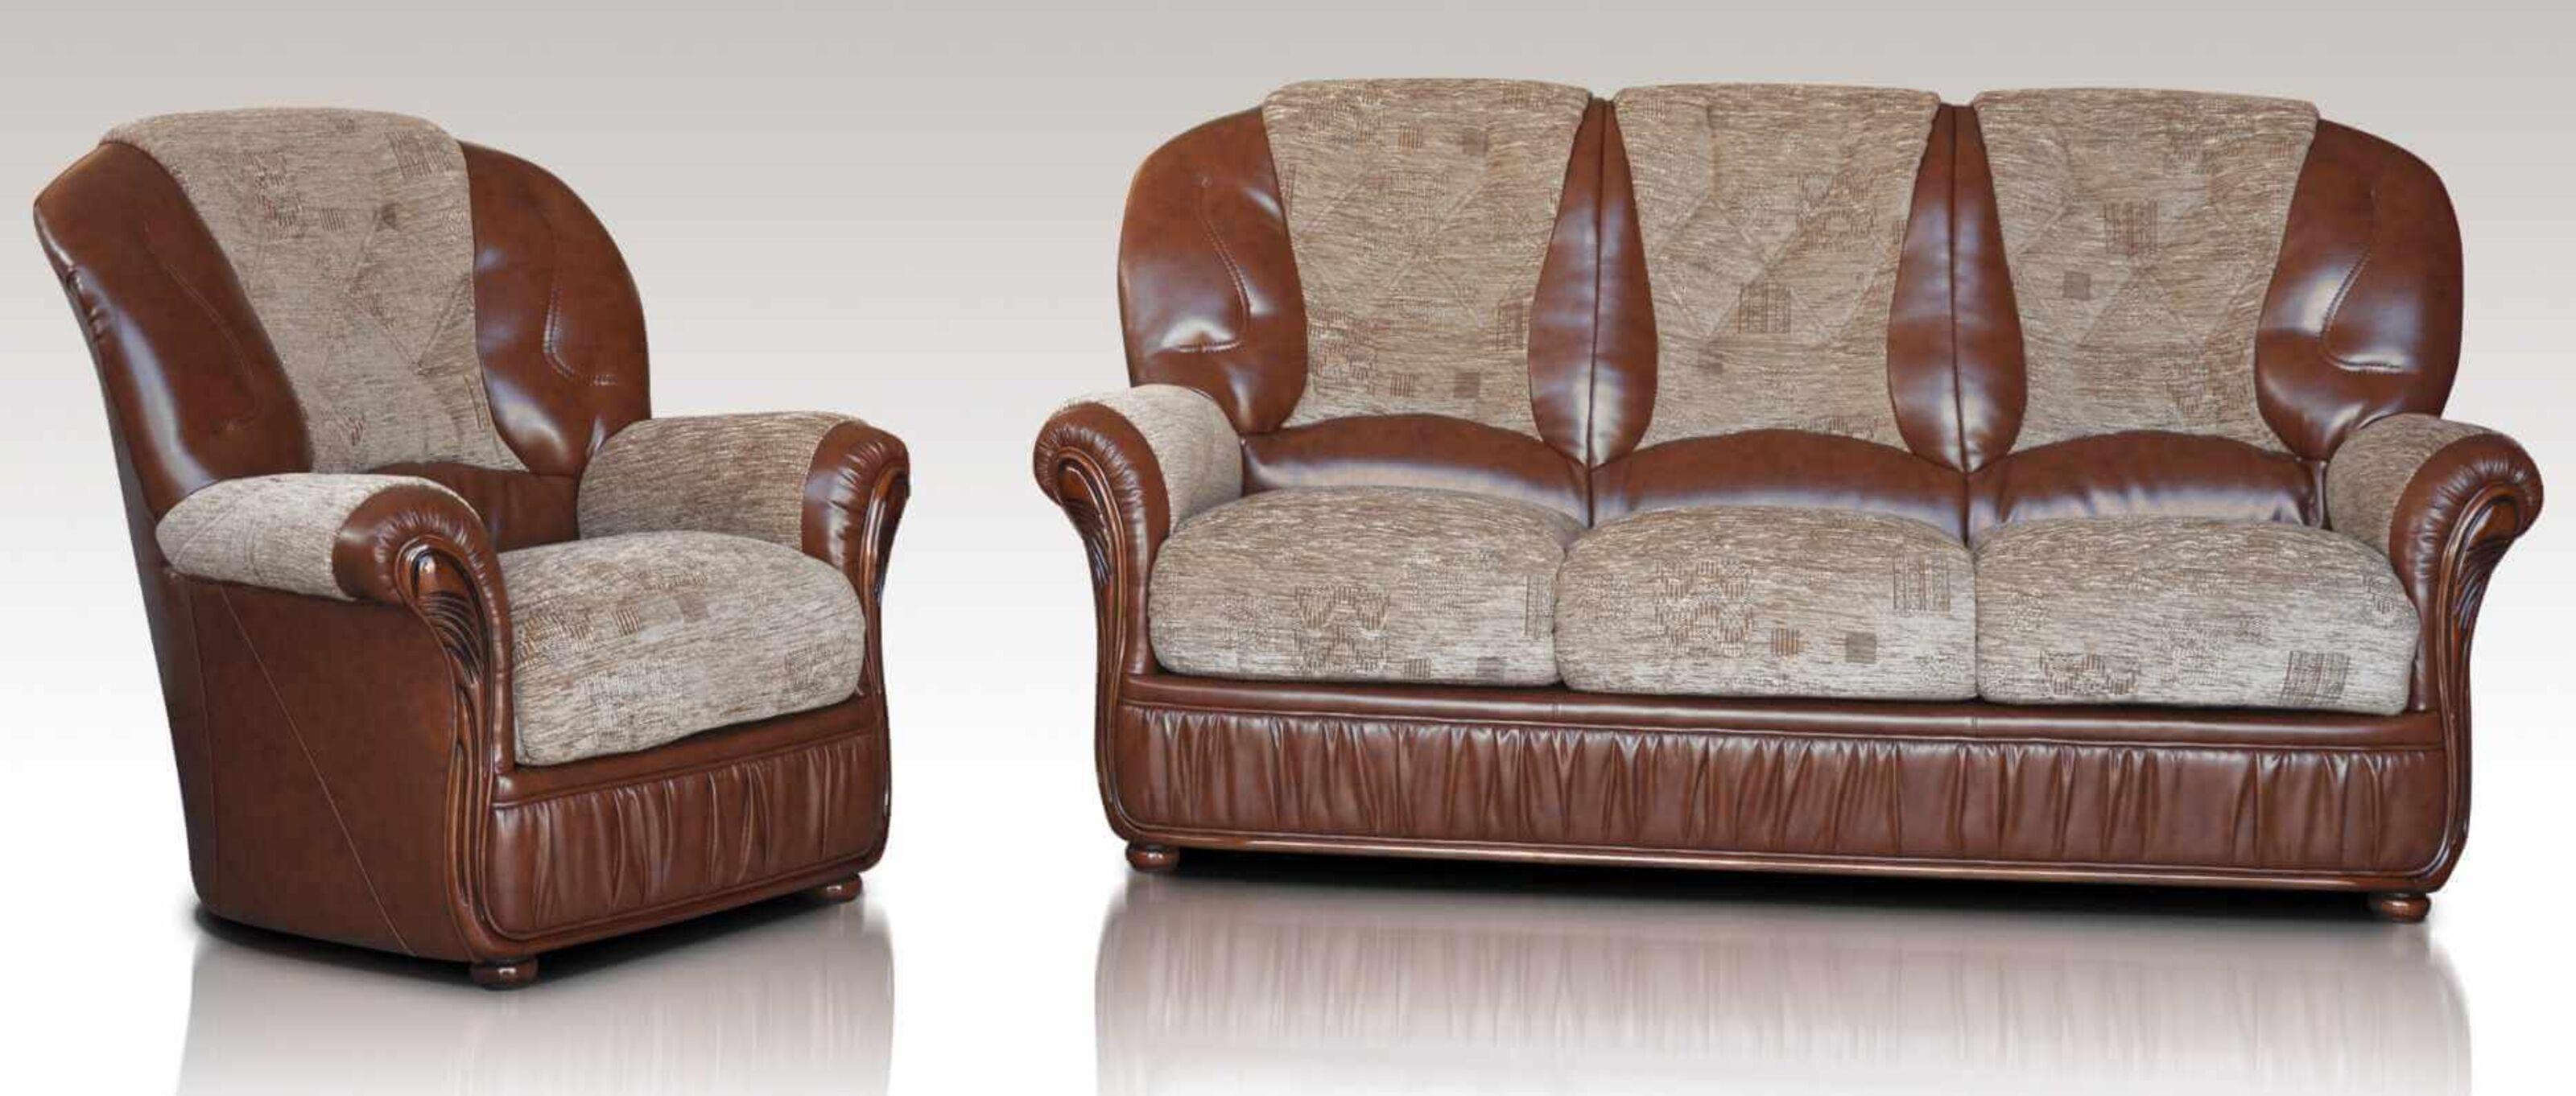 Emma 3+1 Genuine Italian Brown Leather Fabric Sofa Suite Offer